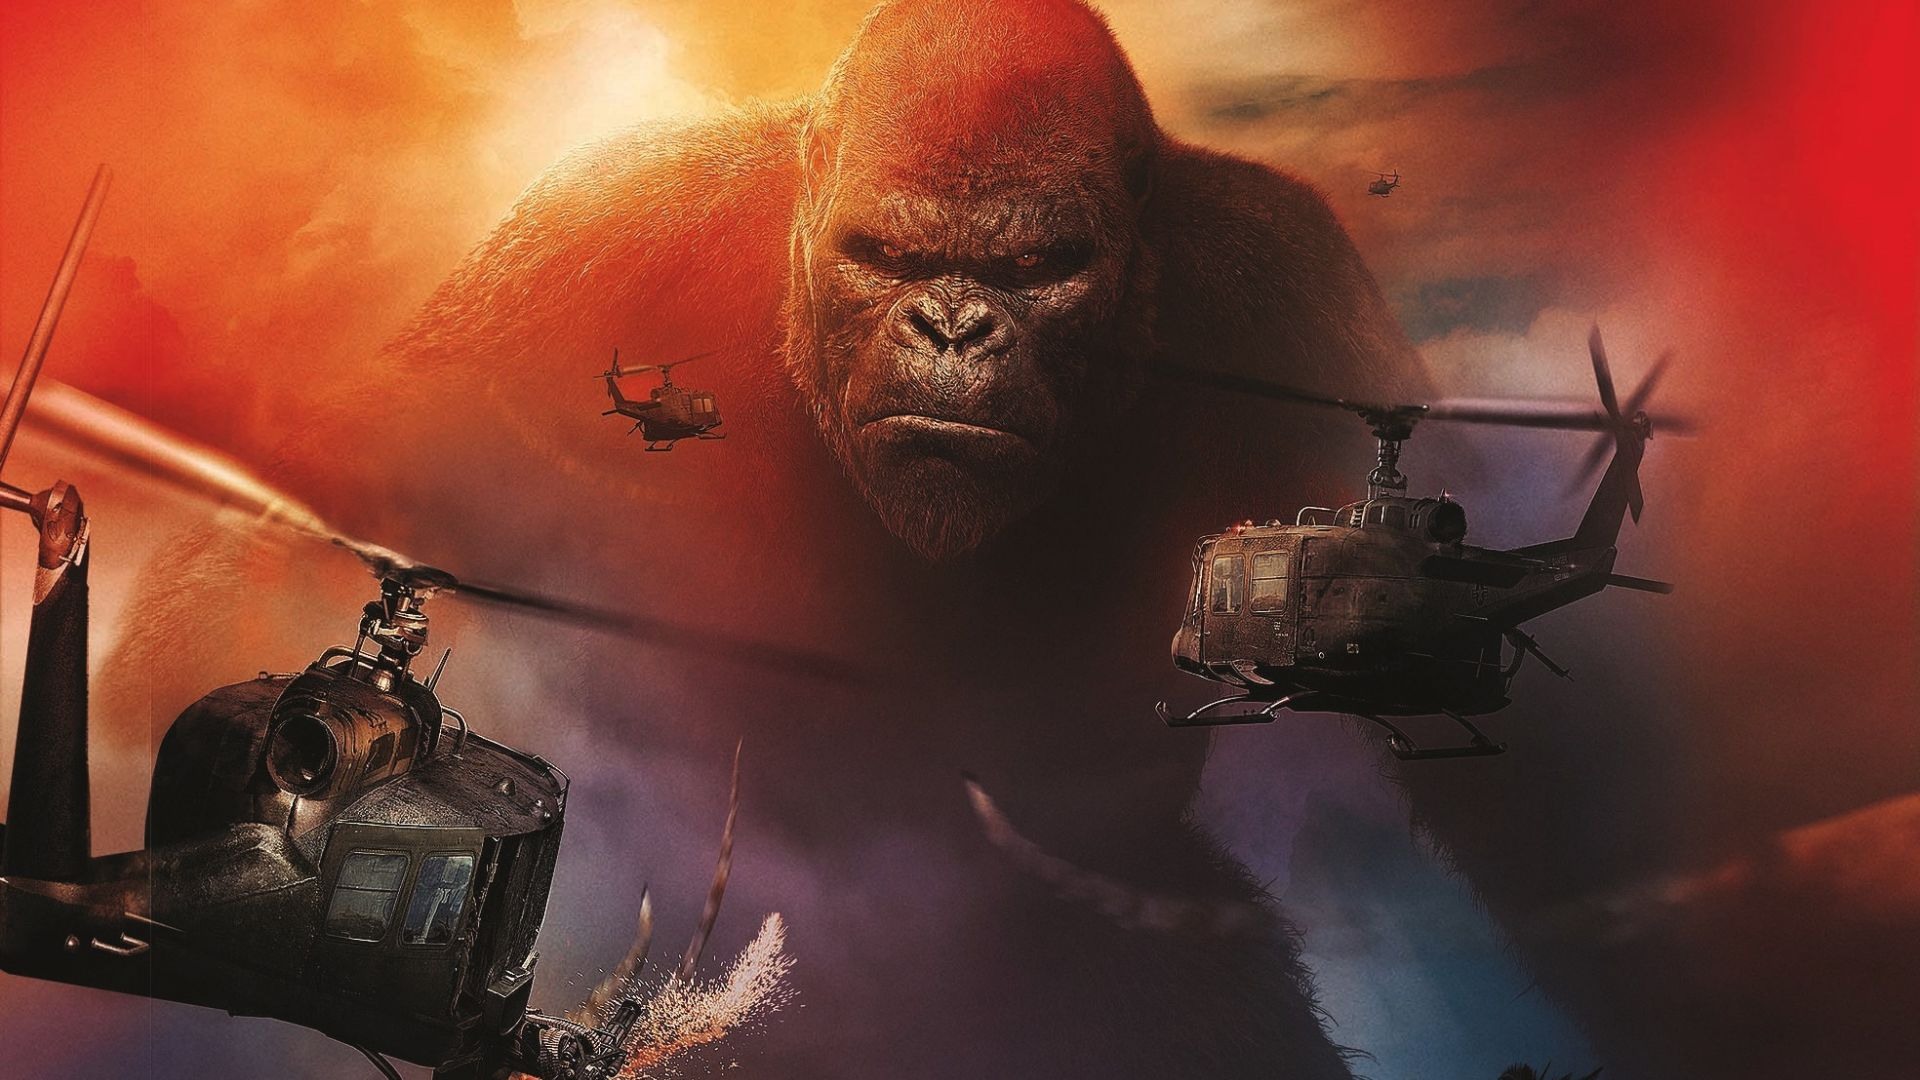 Desktop Wallpaper Kong Skull Island 2017 Movie Monkey